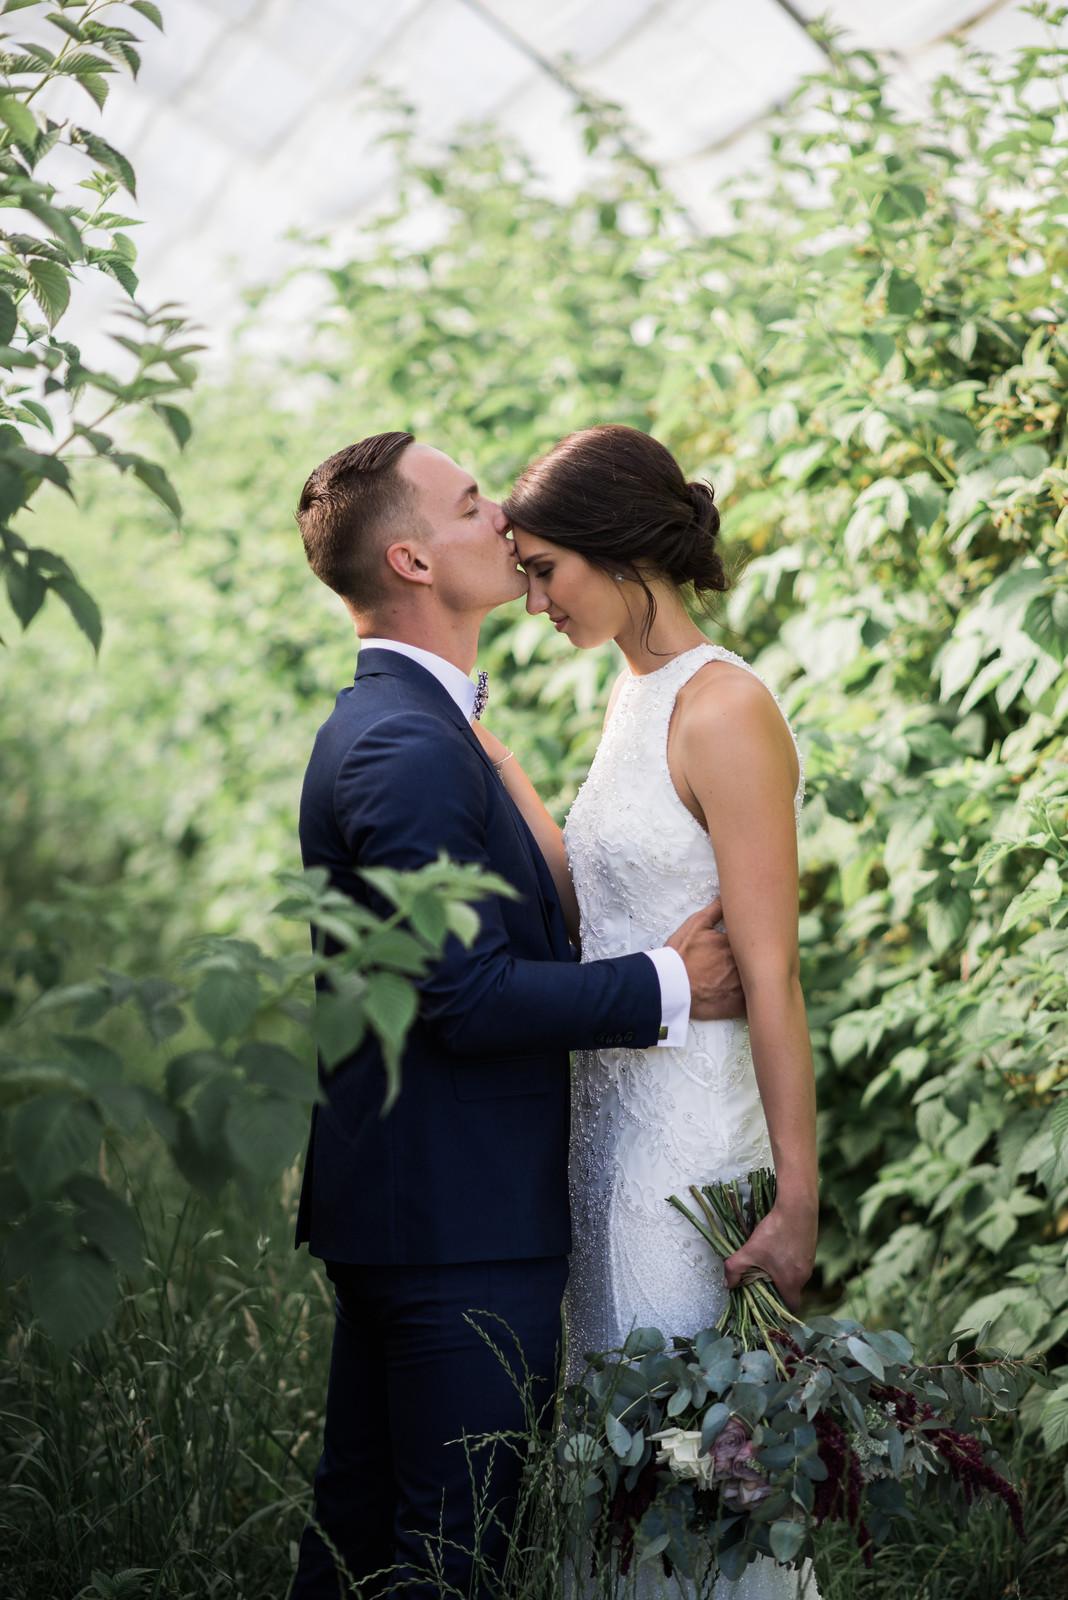 Wedding photographers launceston tasmania 2017